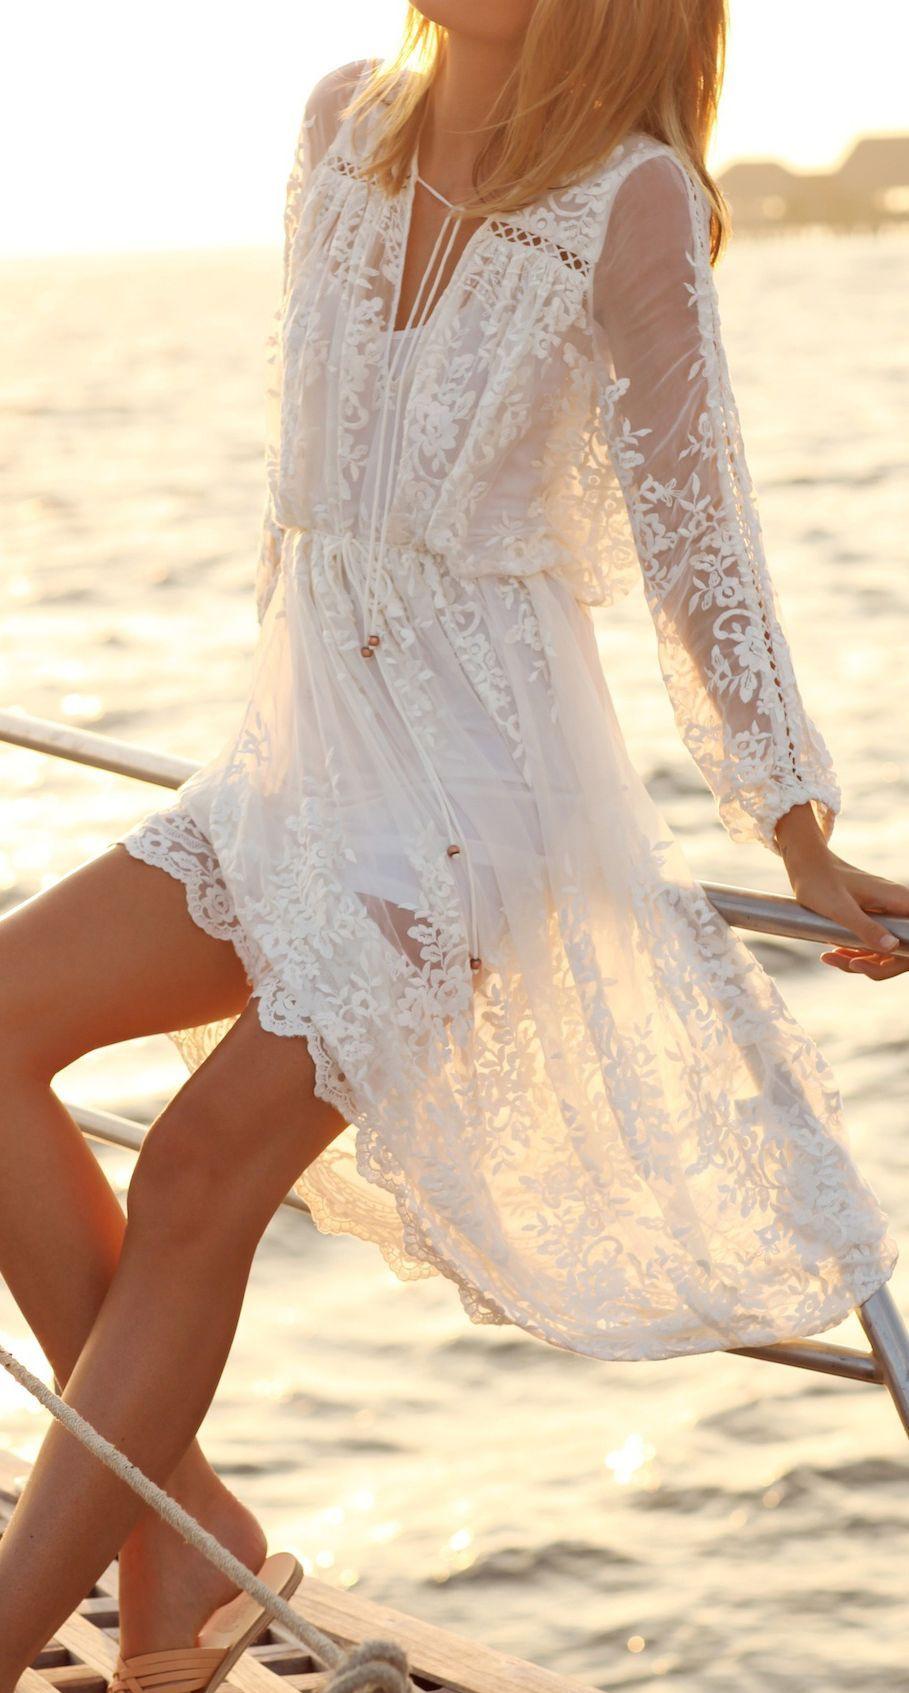 9eec7c0e1c51 Summer Beach Style - Boho / Bohemian / Gypsy Lace Dress - If you like